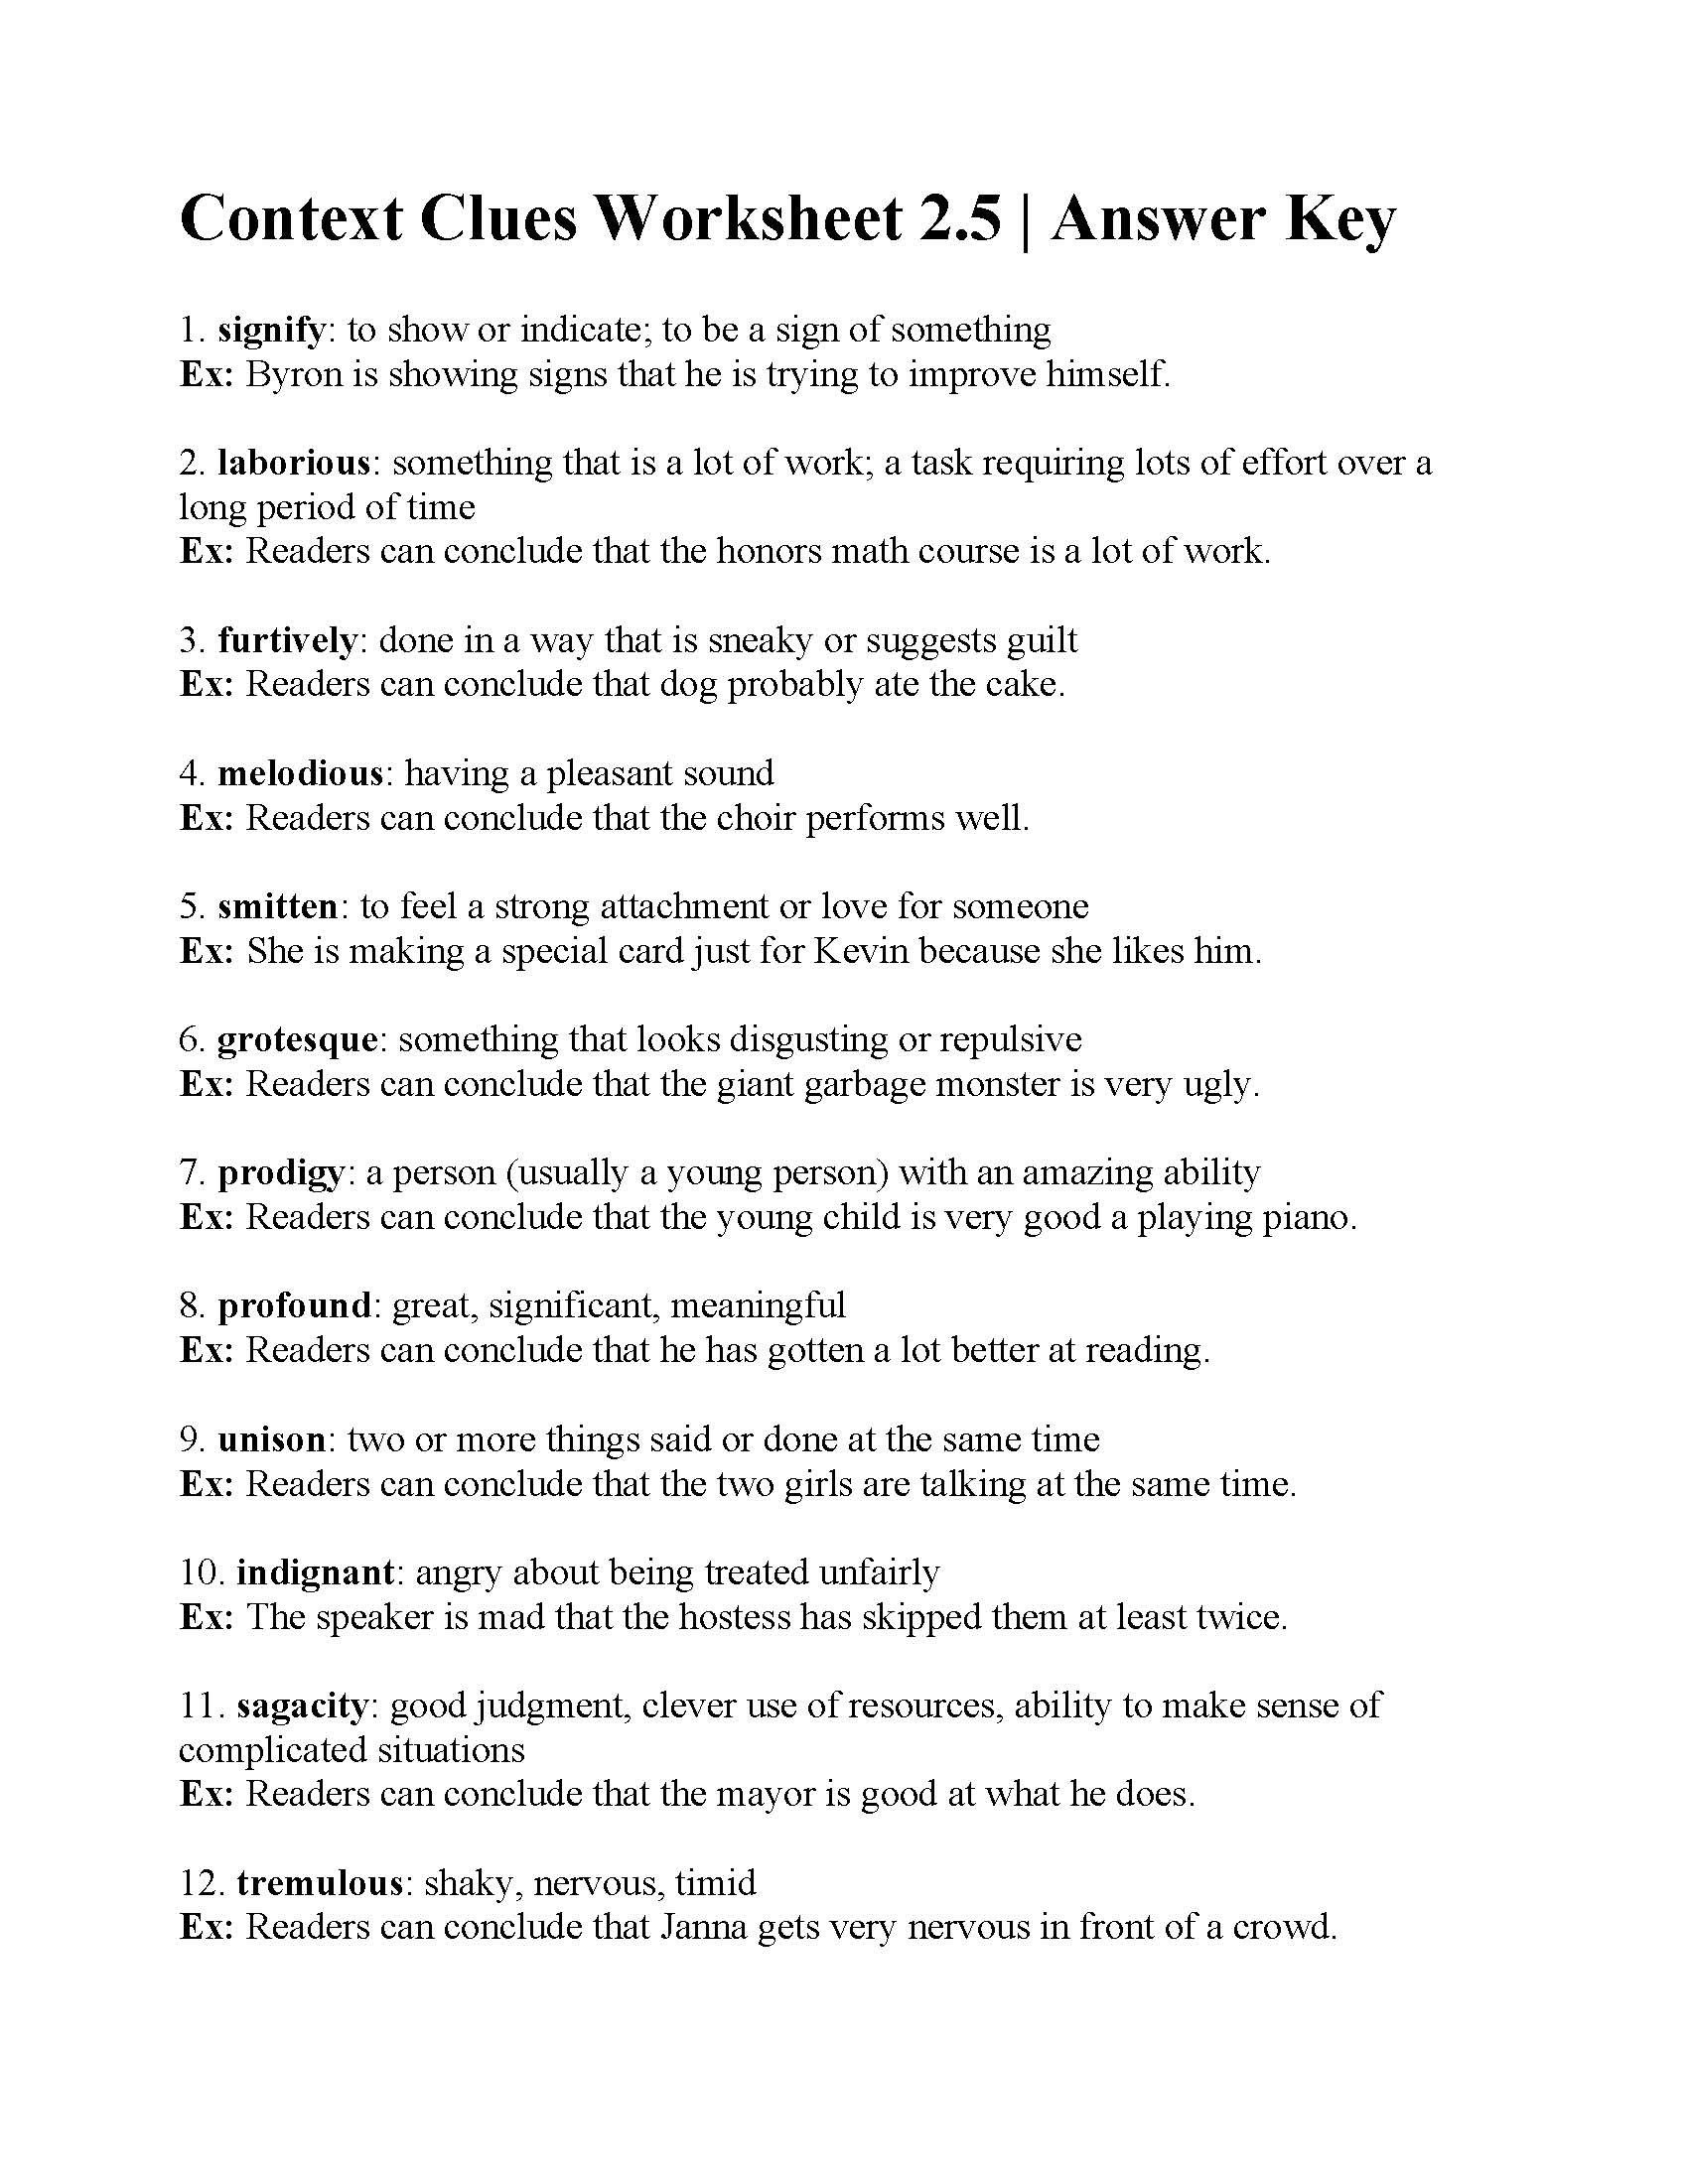 Context Clues Worksheets Second Grade Context Clues English Worksheet